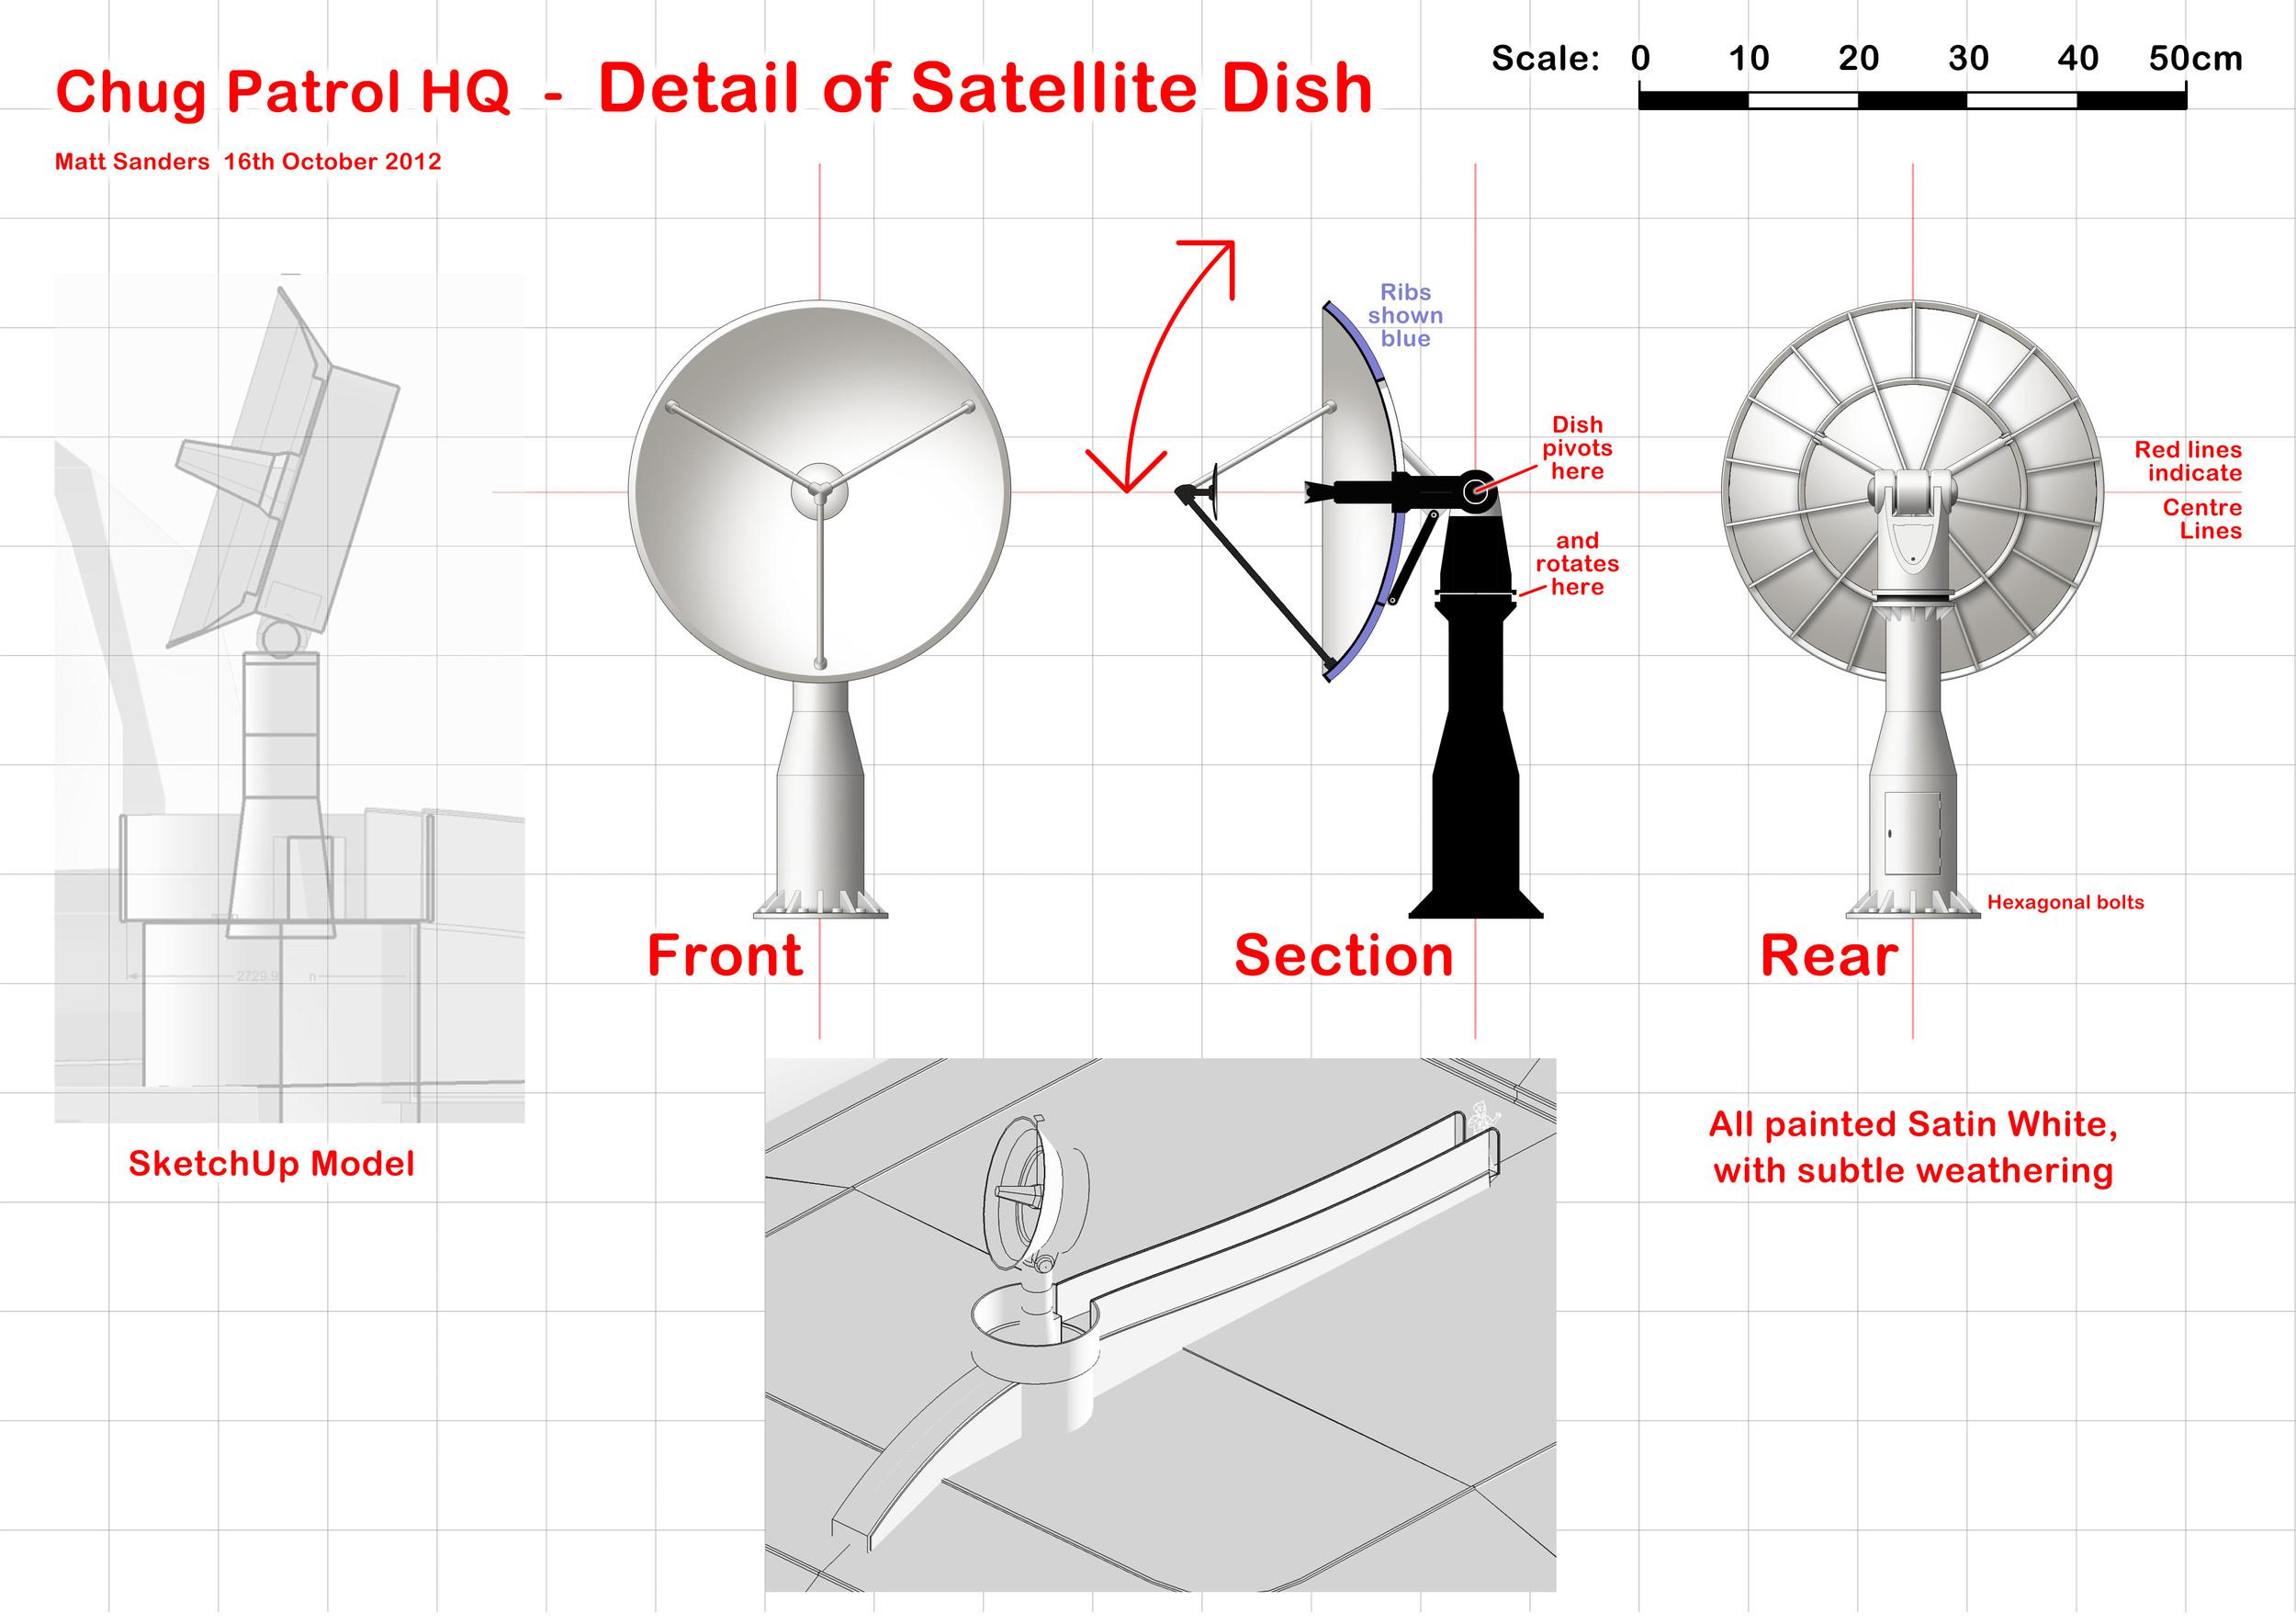 CPHQ Detail of Satellite Dish 16 October.jpg